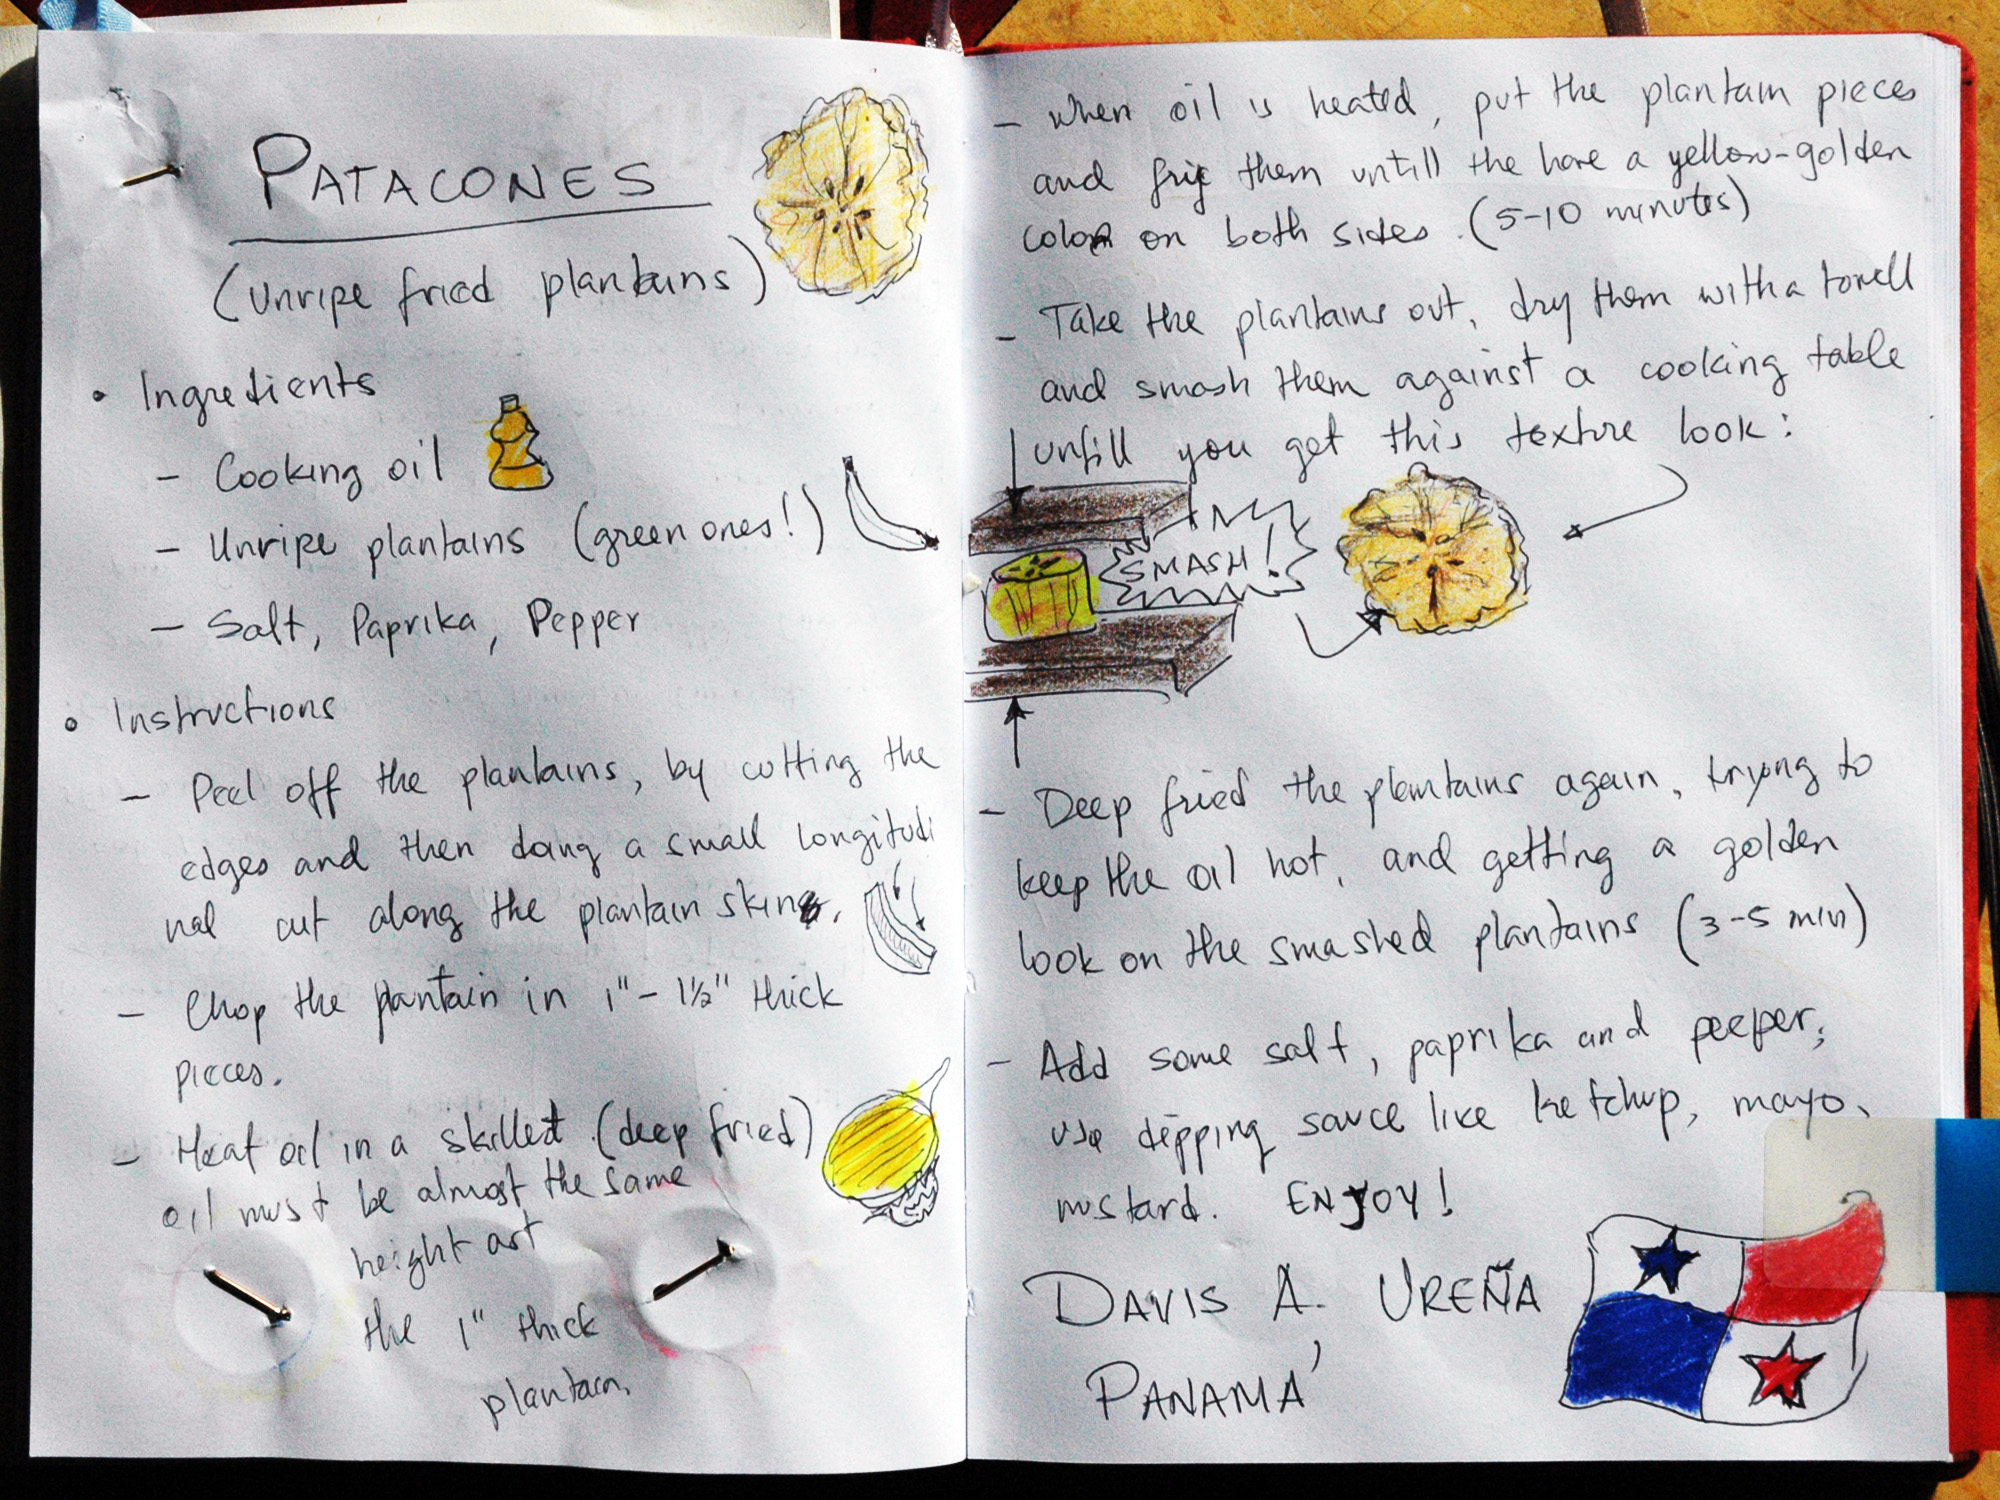 Patacones (Unripe Fried Plantains)